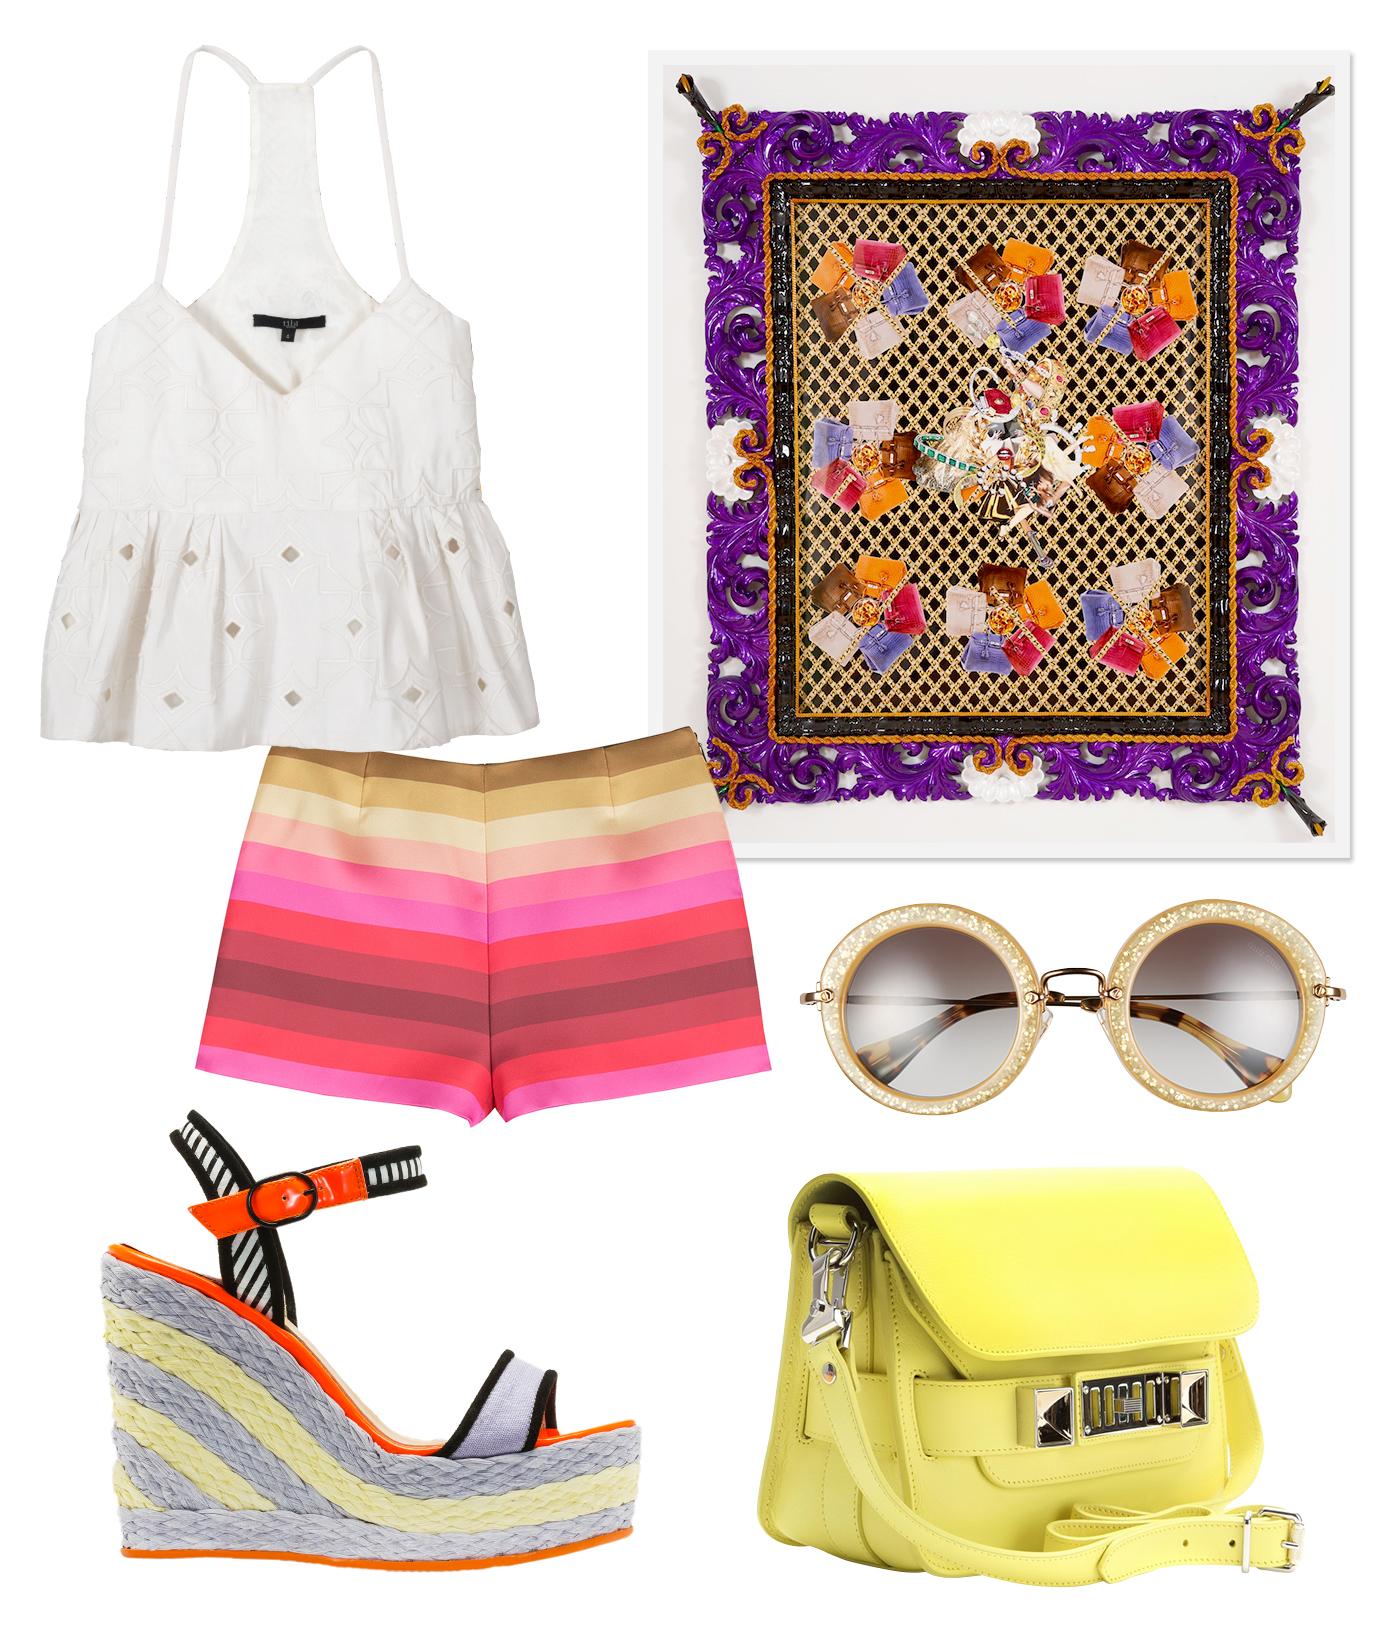 art-basel-outfit-ideas_02.jpg